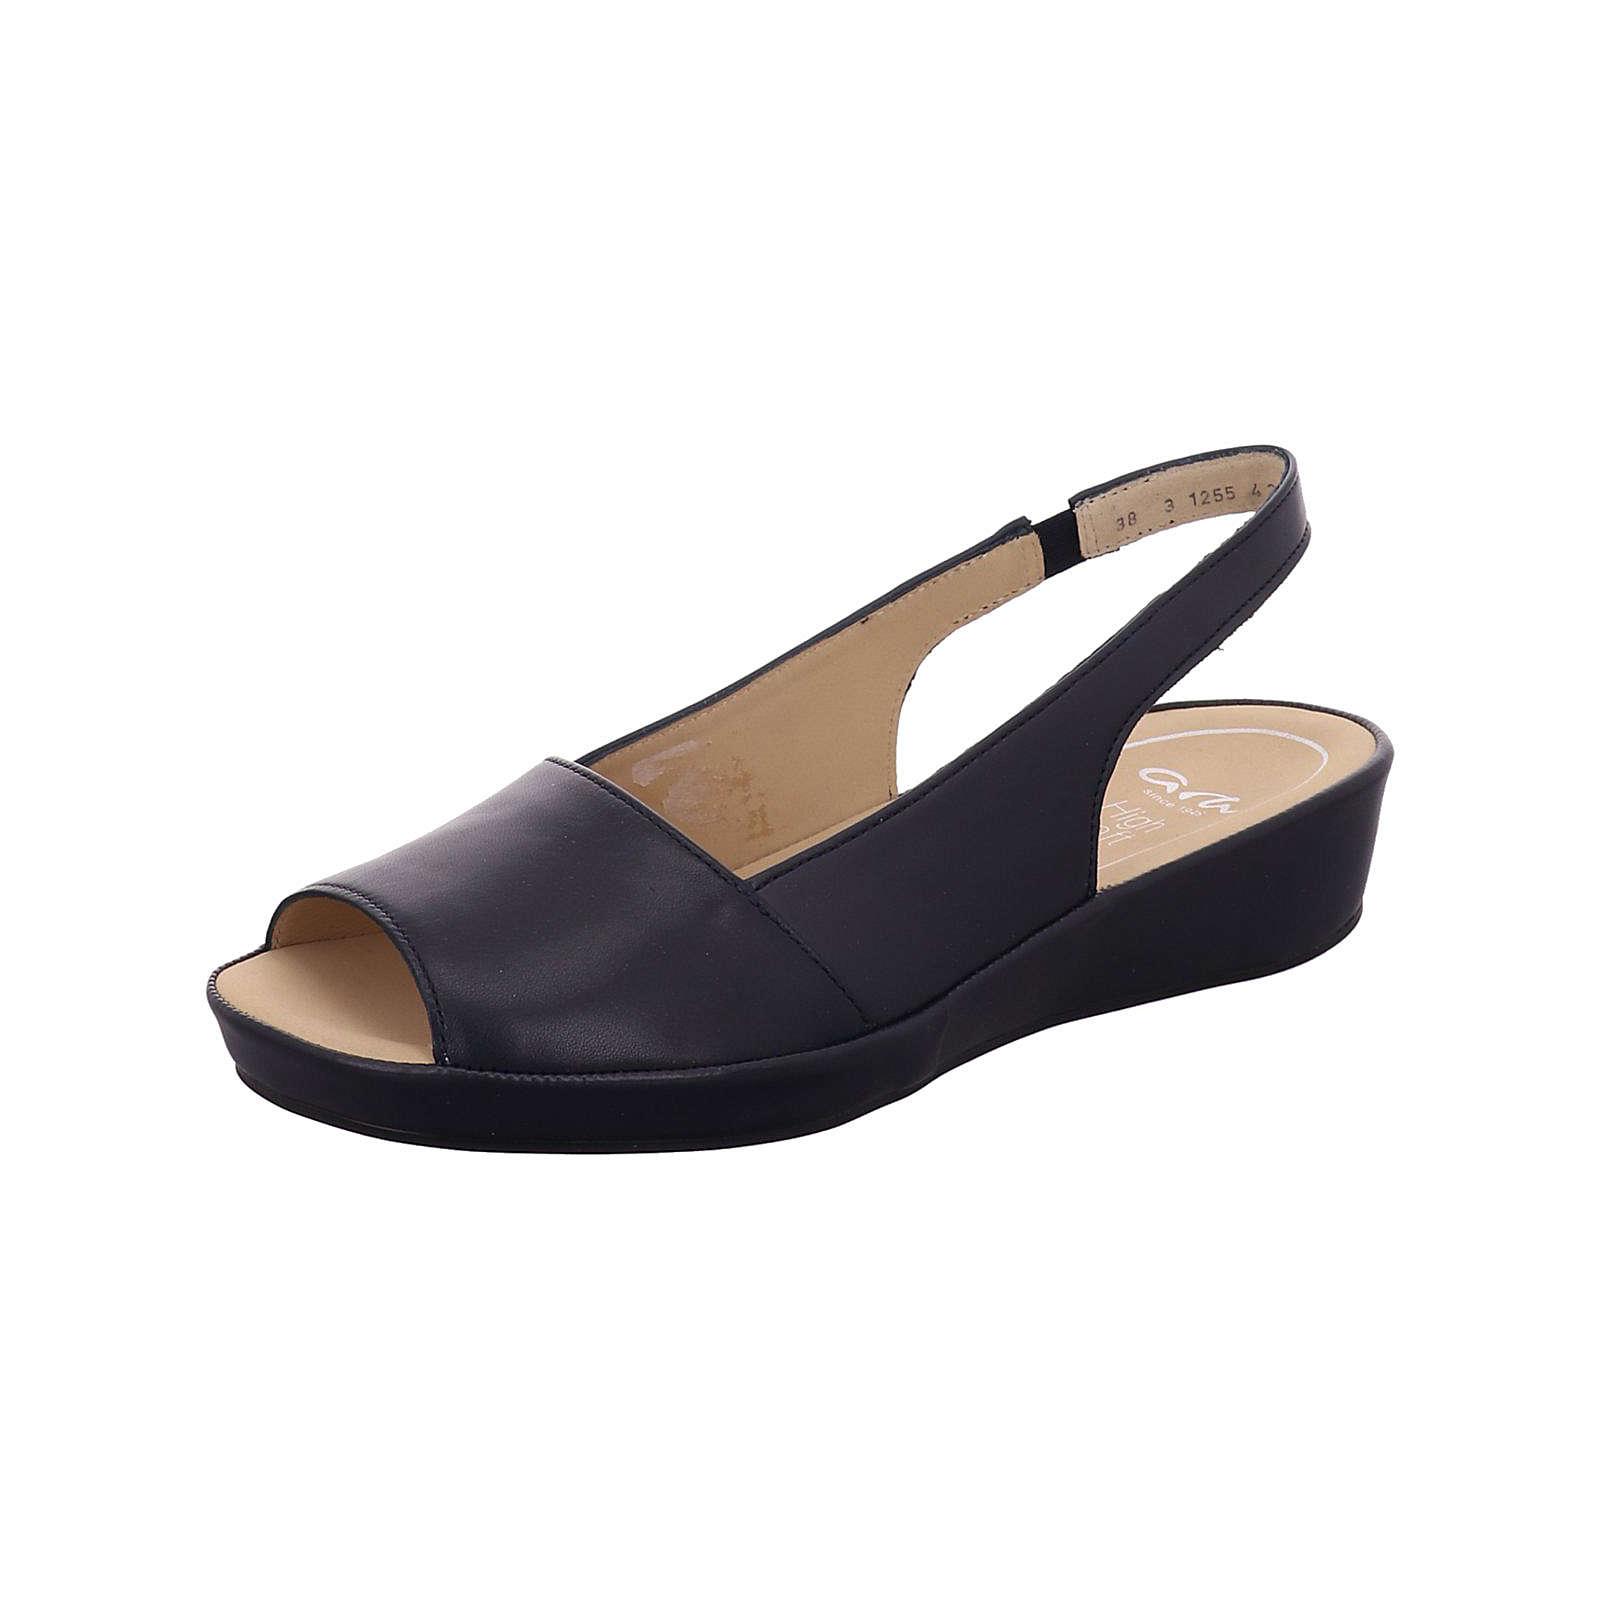 ara Sandalen Klassische Sandalen blau Damen Gr. 36